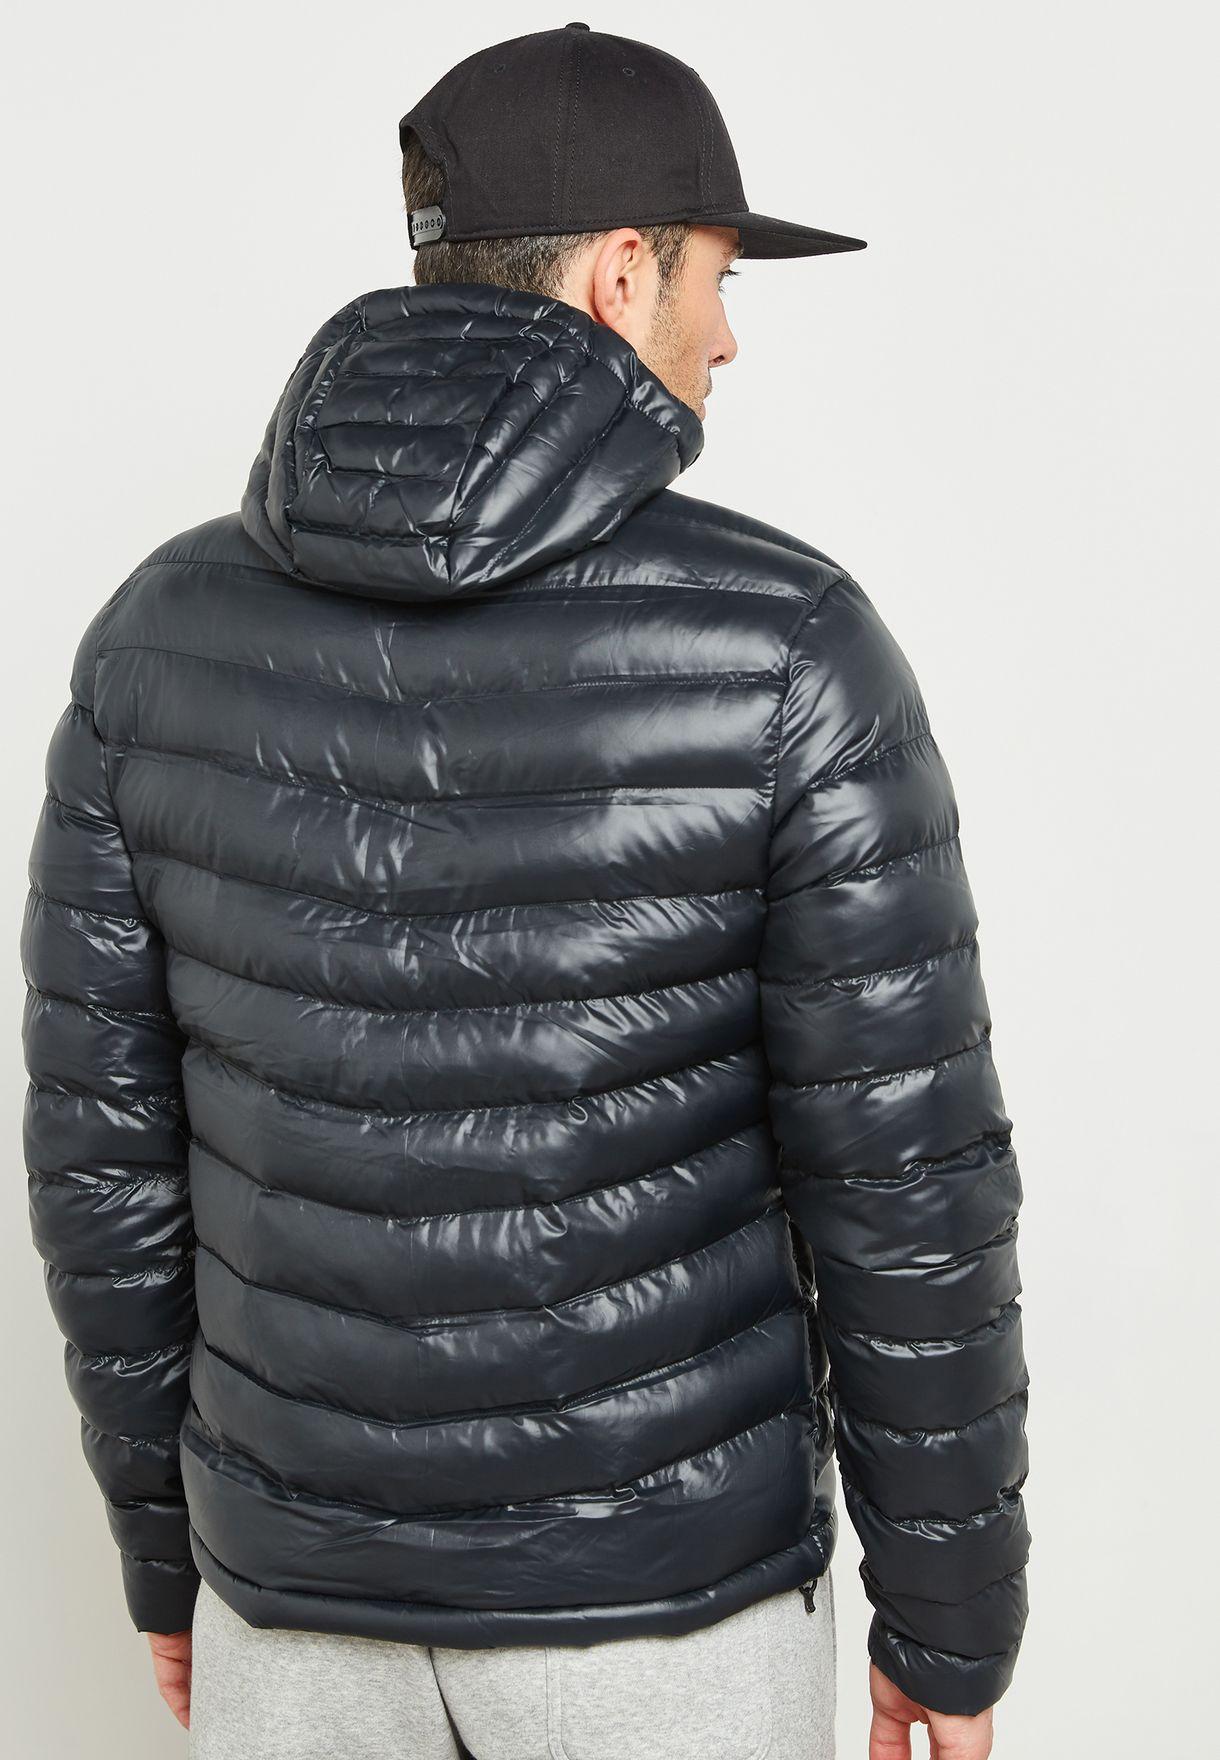 Cytins Padded Jacket